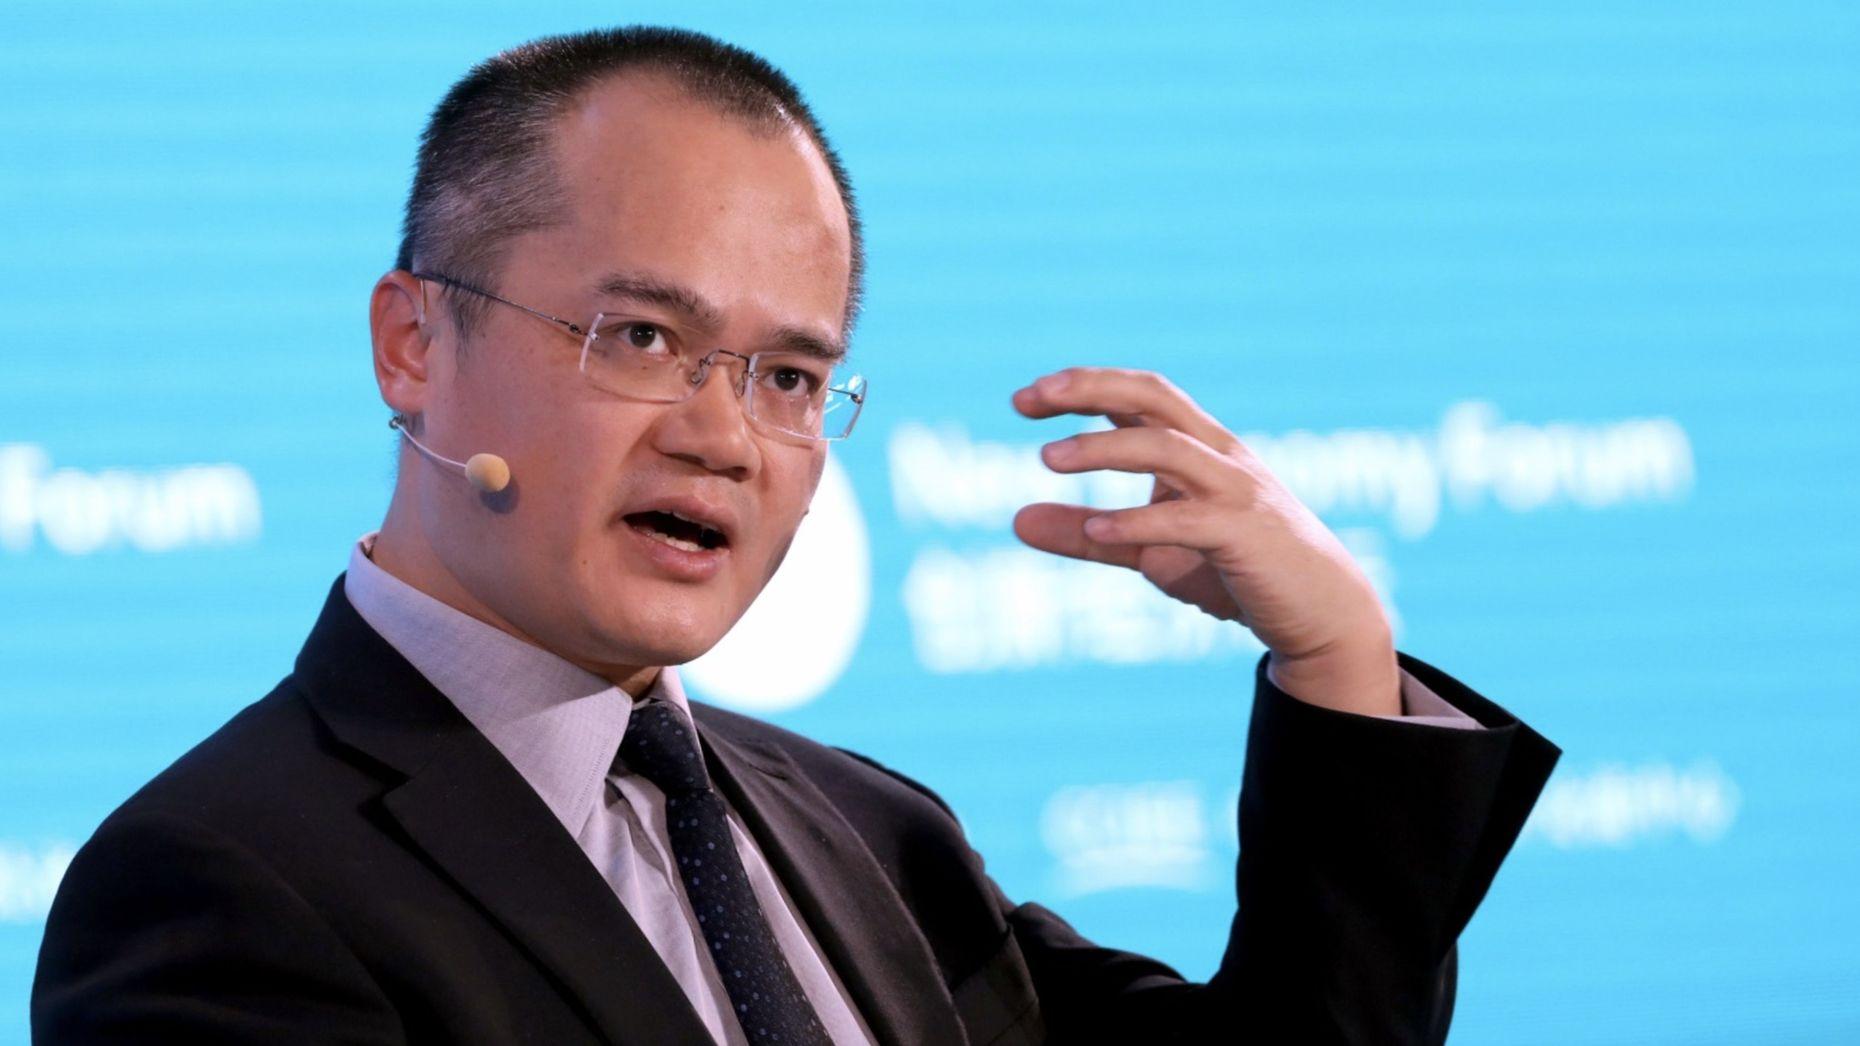 Meituan CEO Wang Xing. Photo by Bloomberg